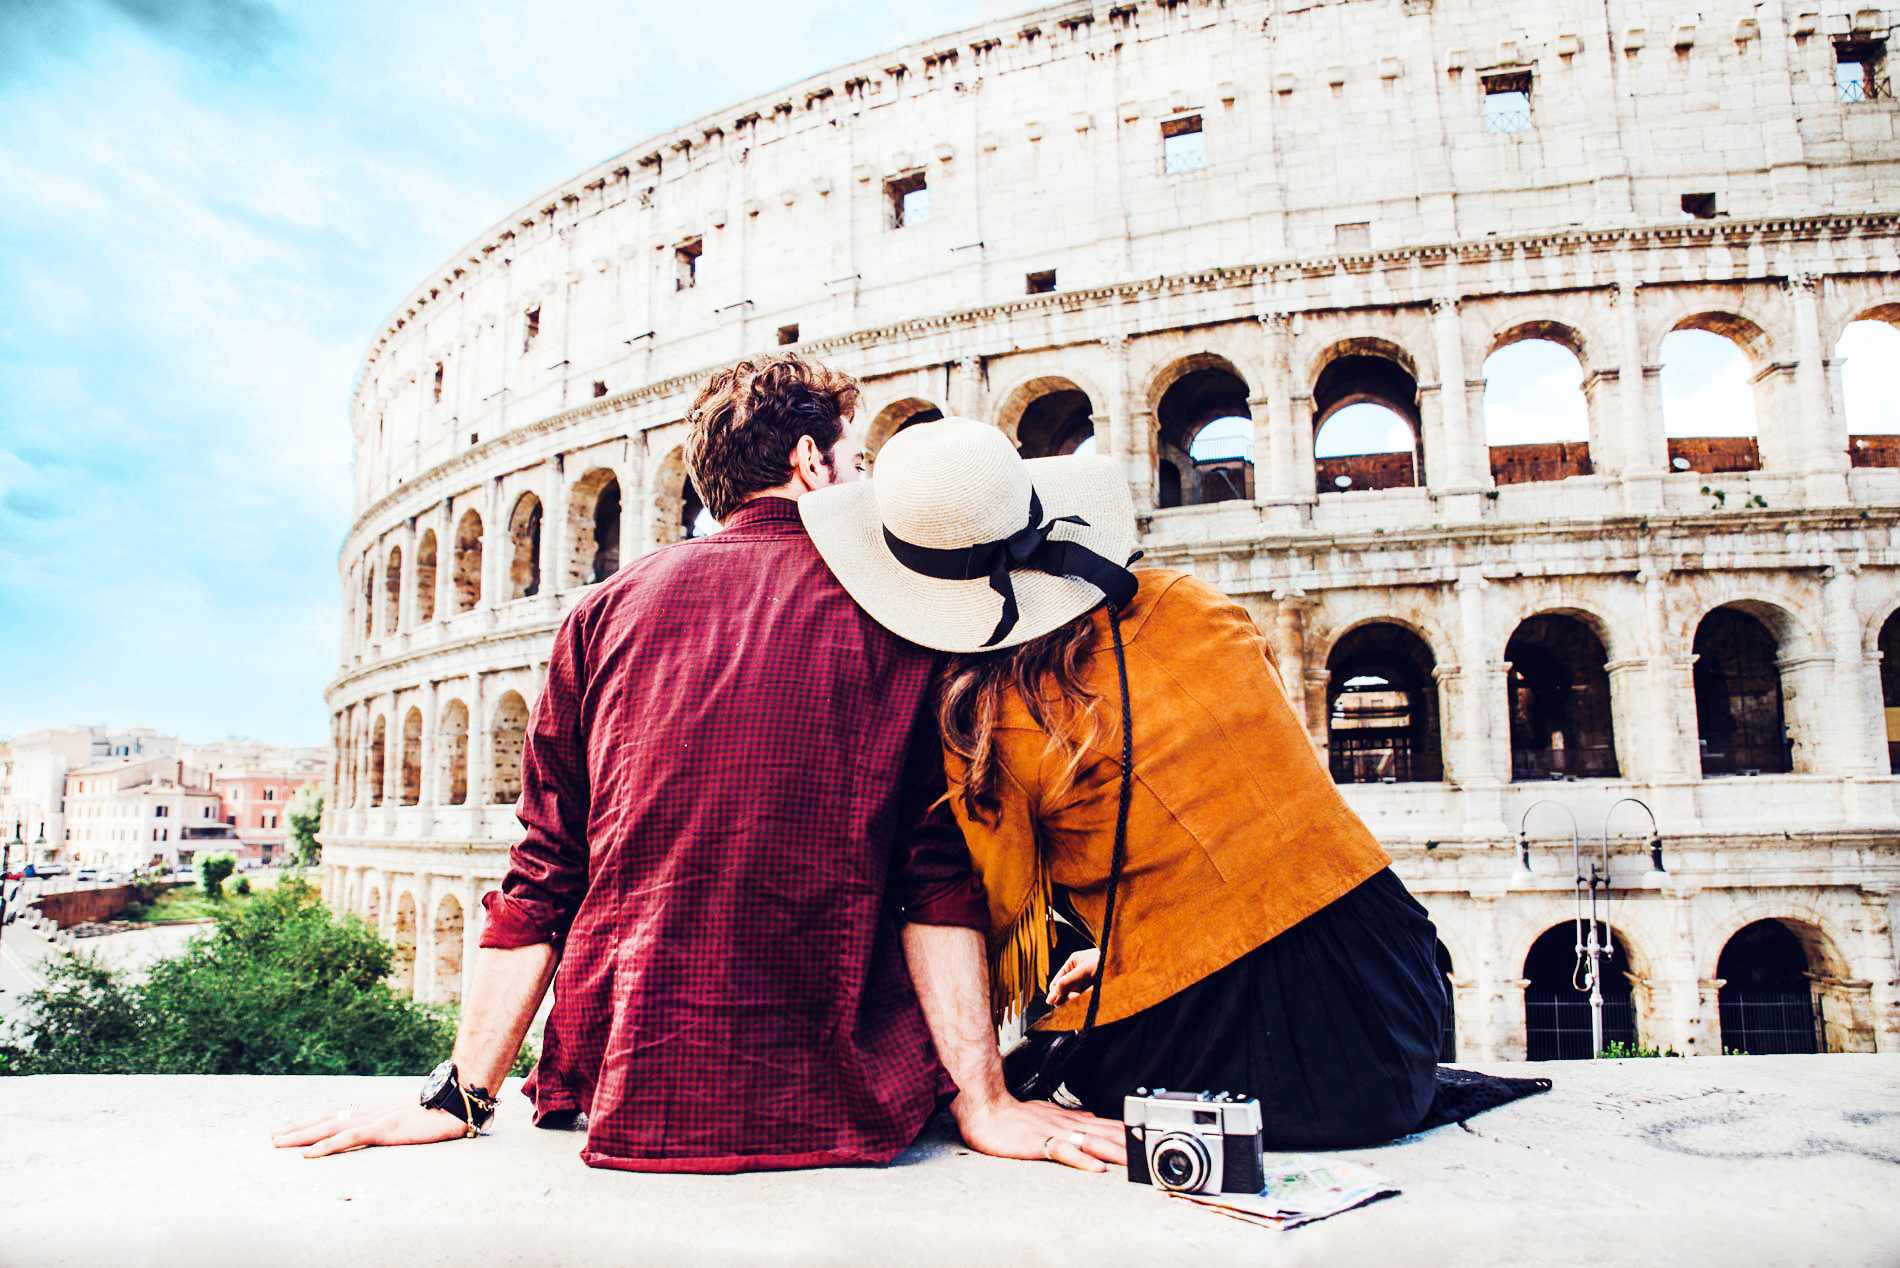 Захватывающее путешествие по Европе: Рим, Савона, Марсель, Барселона, Валенсия, Палермо - Туристический оператор APL Travel (АПЛ Тревел)